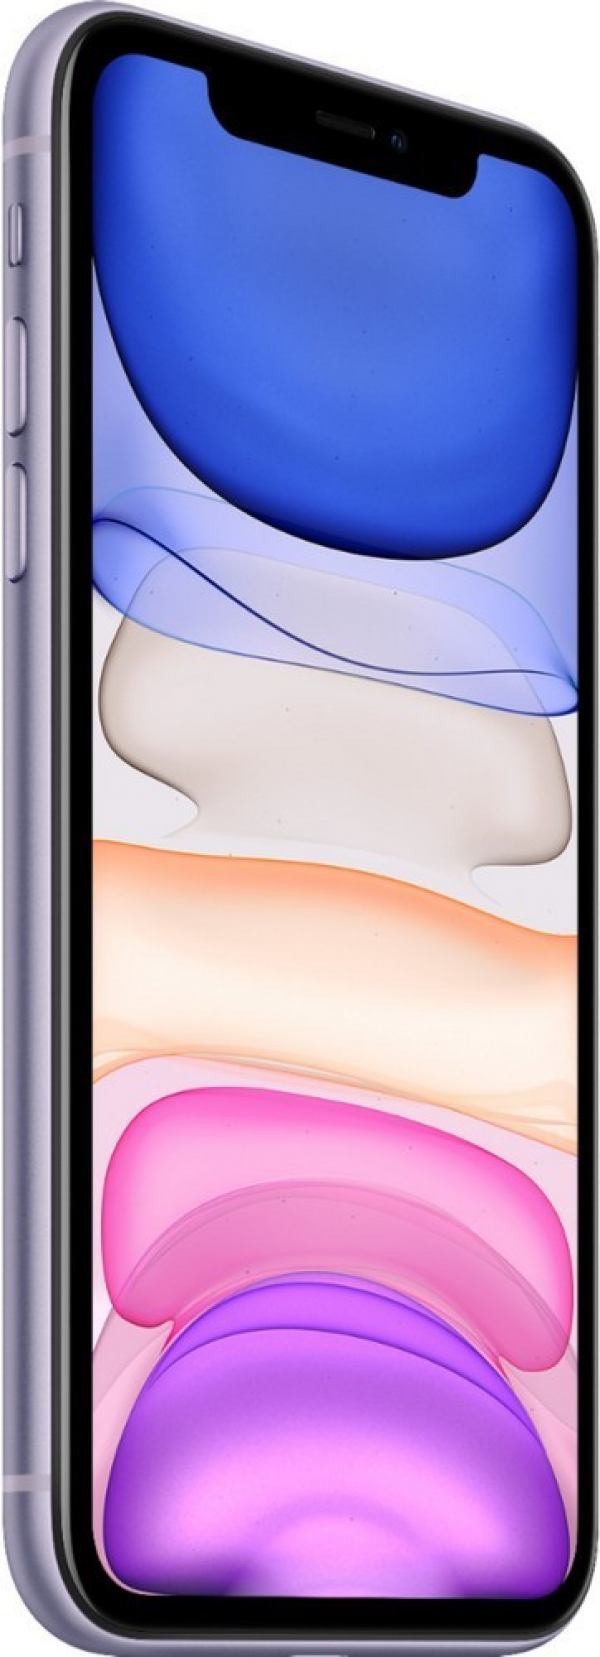 APPLE Iphone 11 128GB purple MHDM3SEA